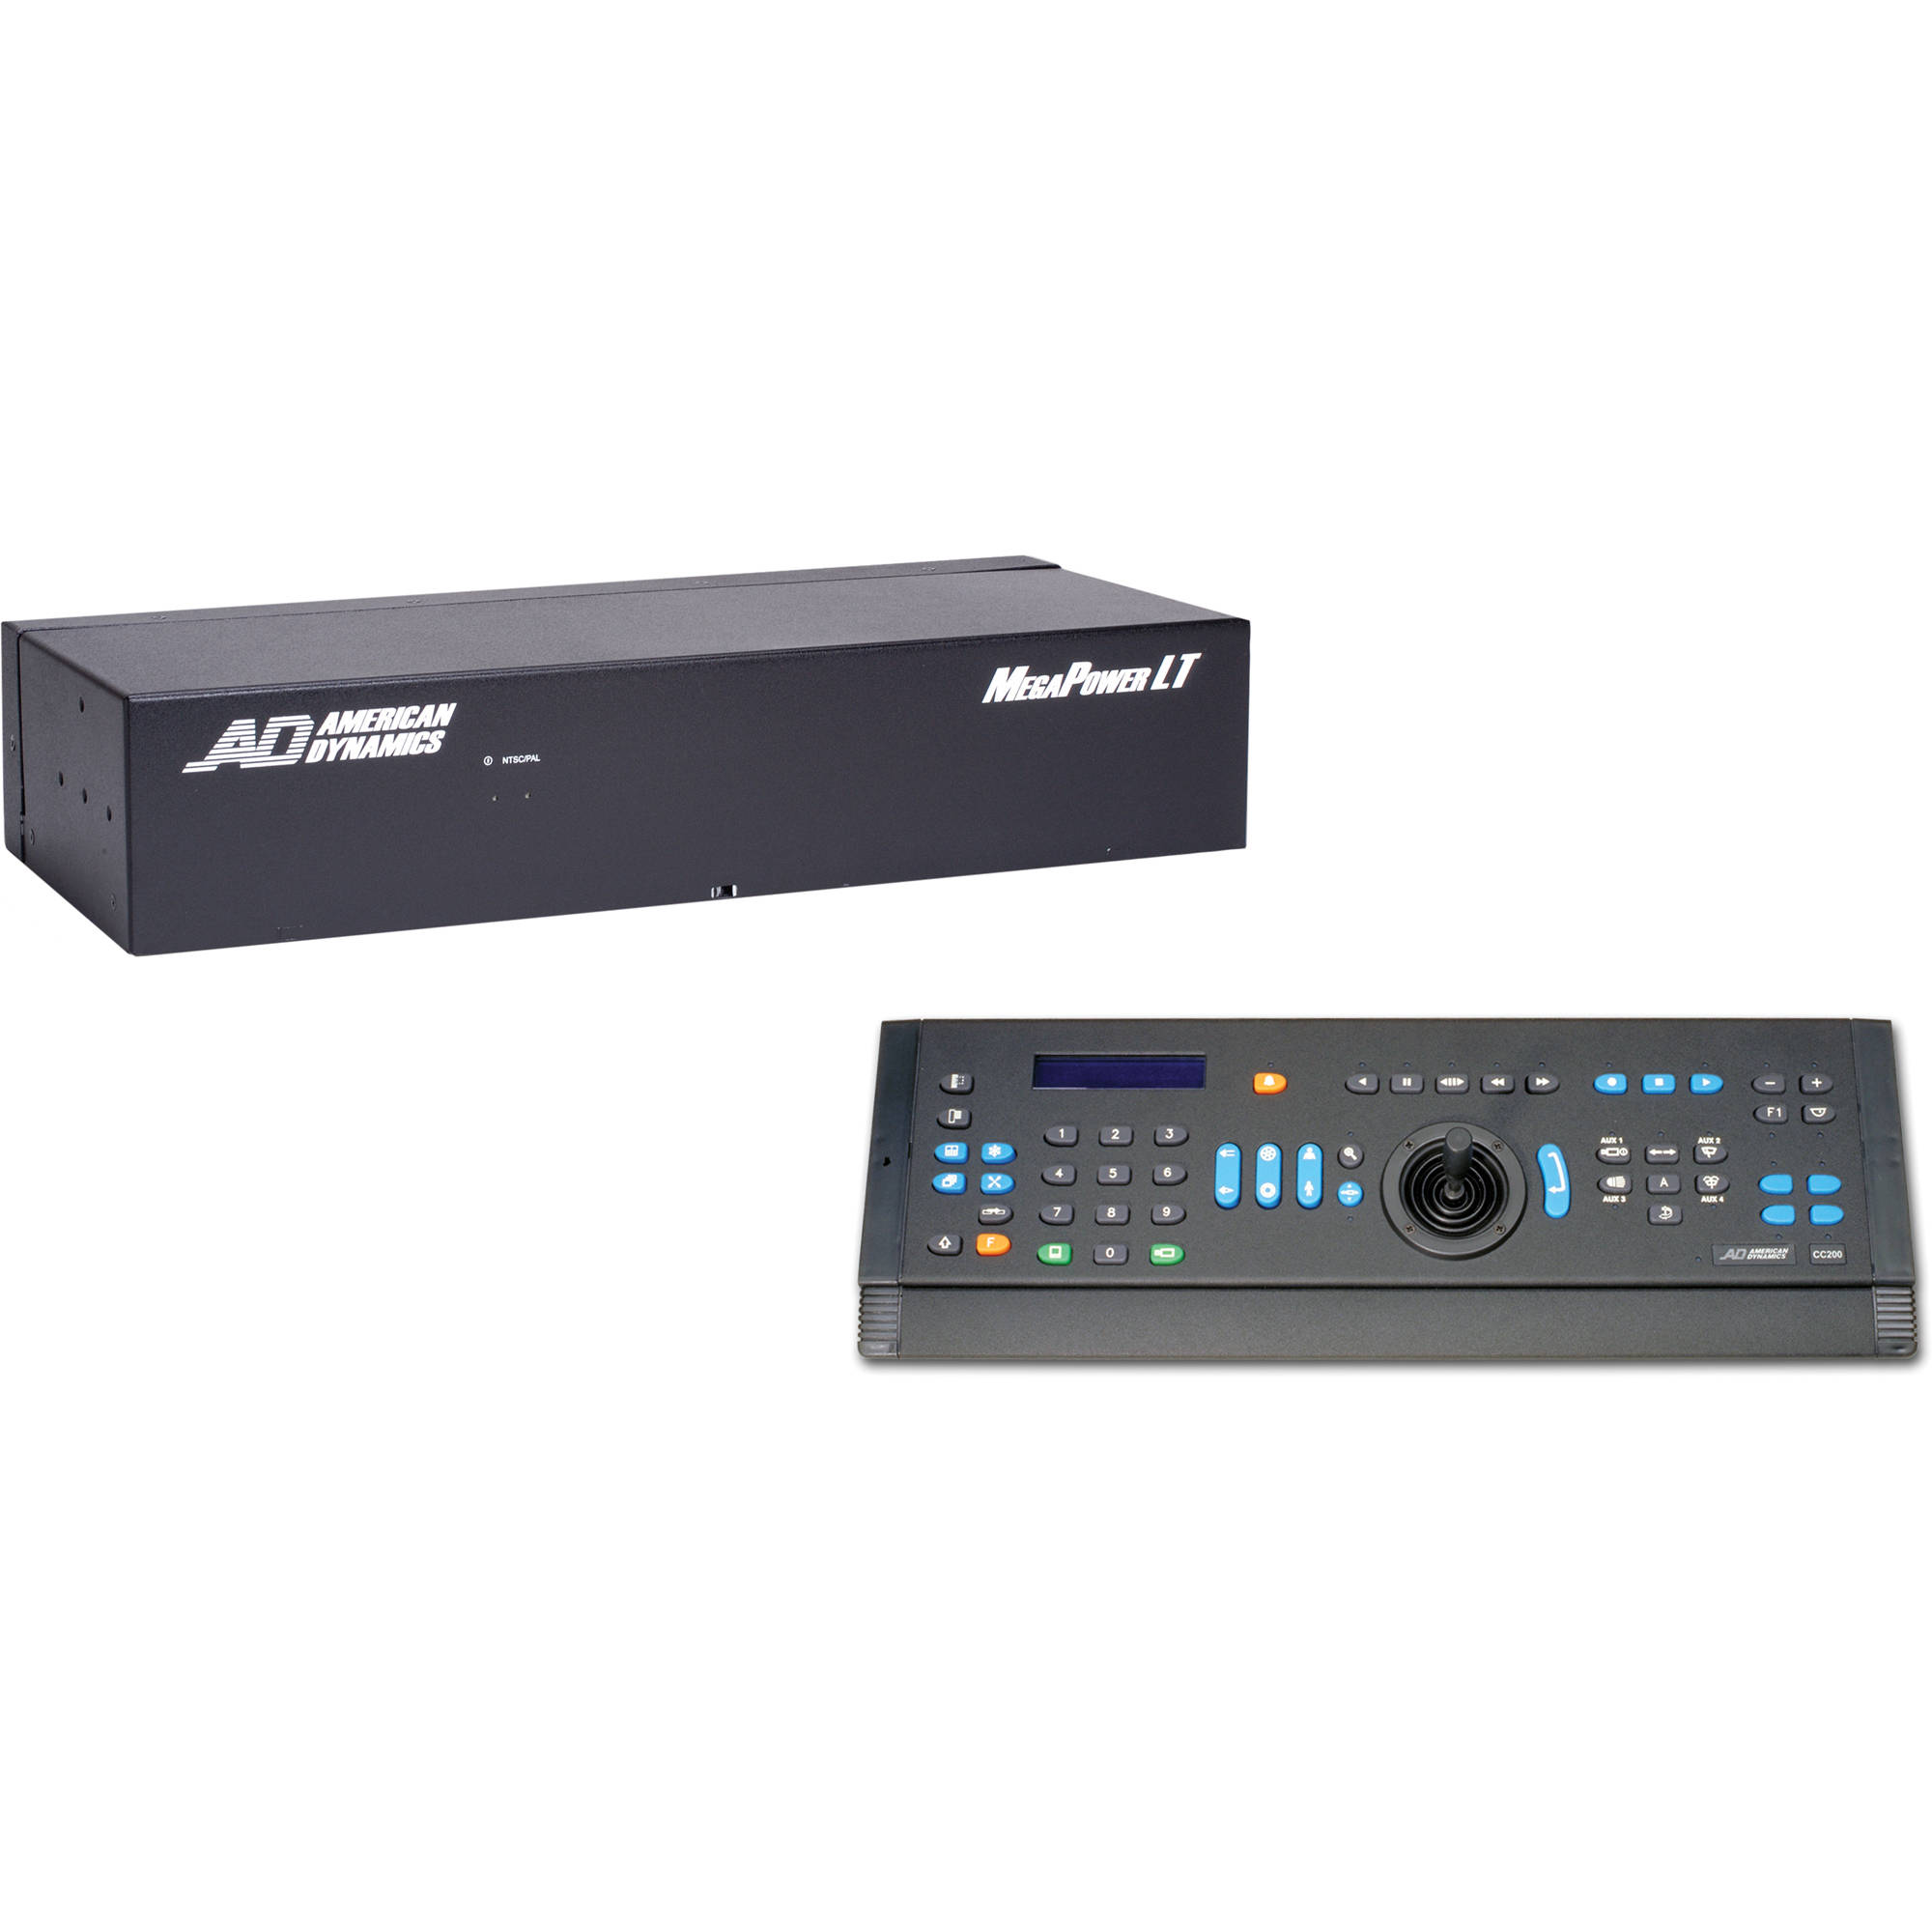 American Dynamics Megapower Lt Matrix Admplt16c2 Bh Photo Video Cat5 Wiring On Av Switches Audio Switch Switcher Controller System 16x4 Cc 200